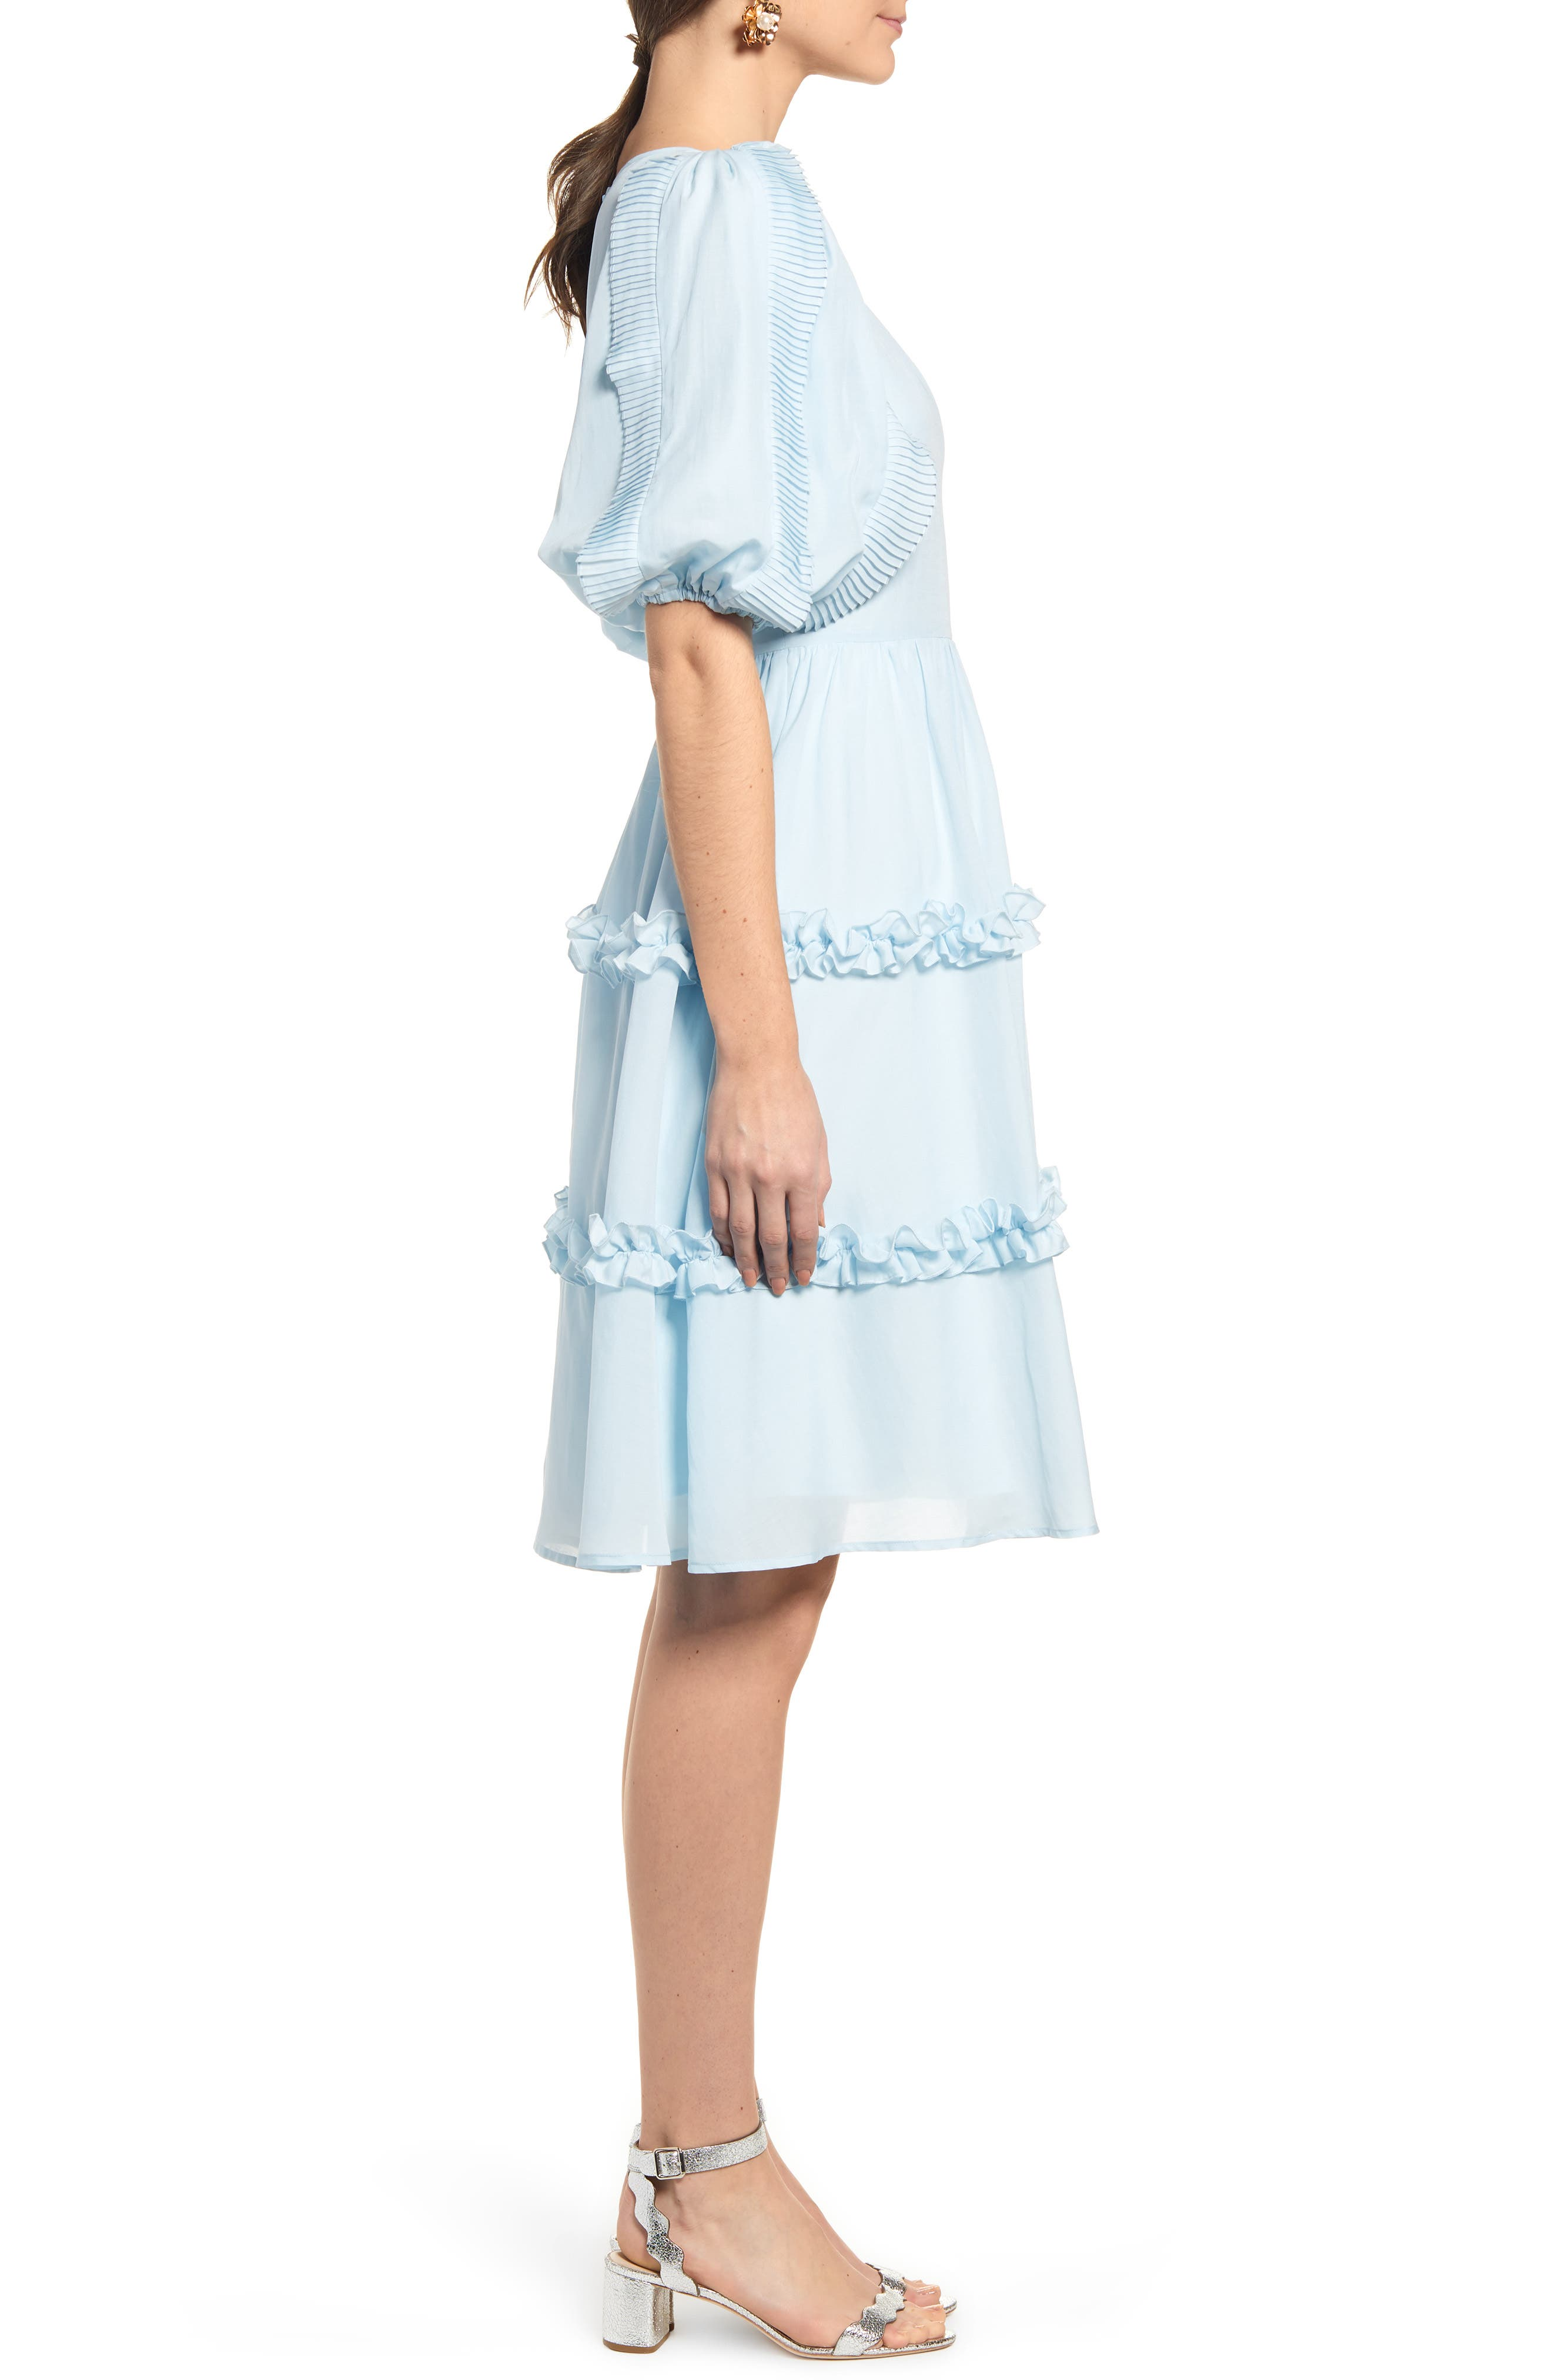 RACHEL PARCELL, Ruffle Sleeve Dress, Alternate thumbnail 4, color, BLUE WINTER